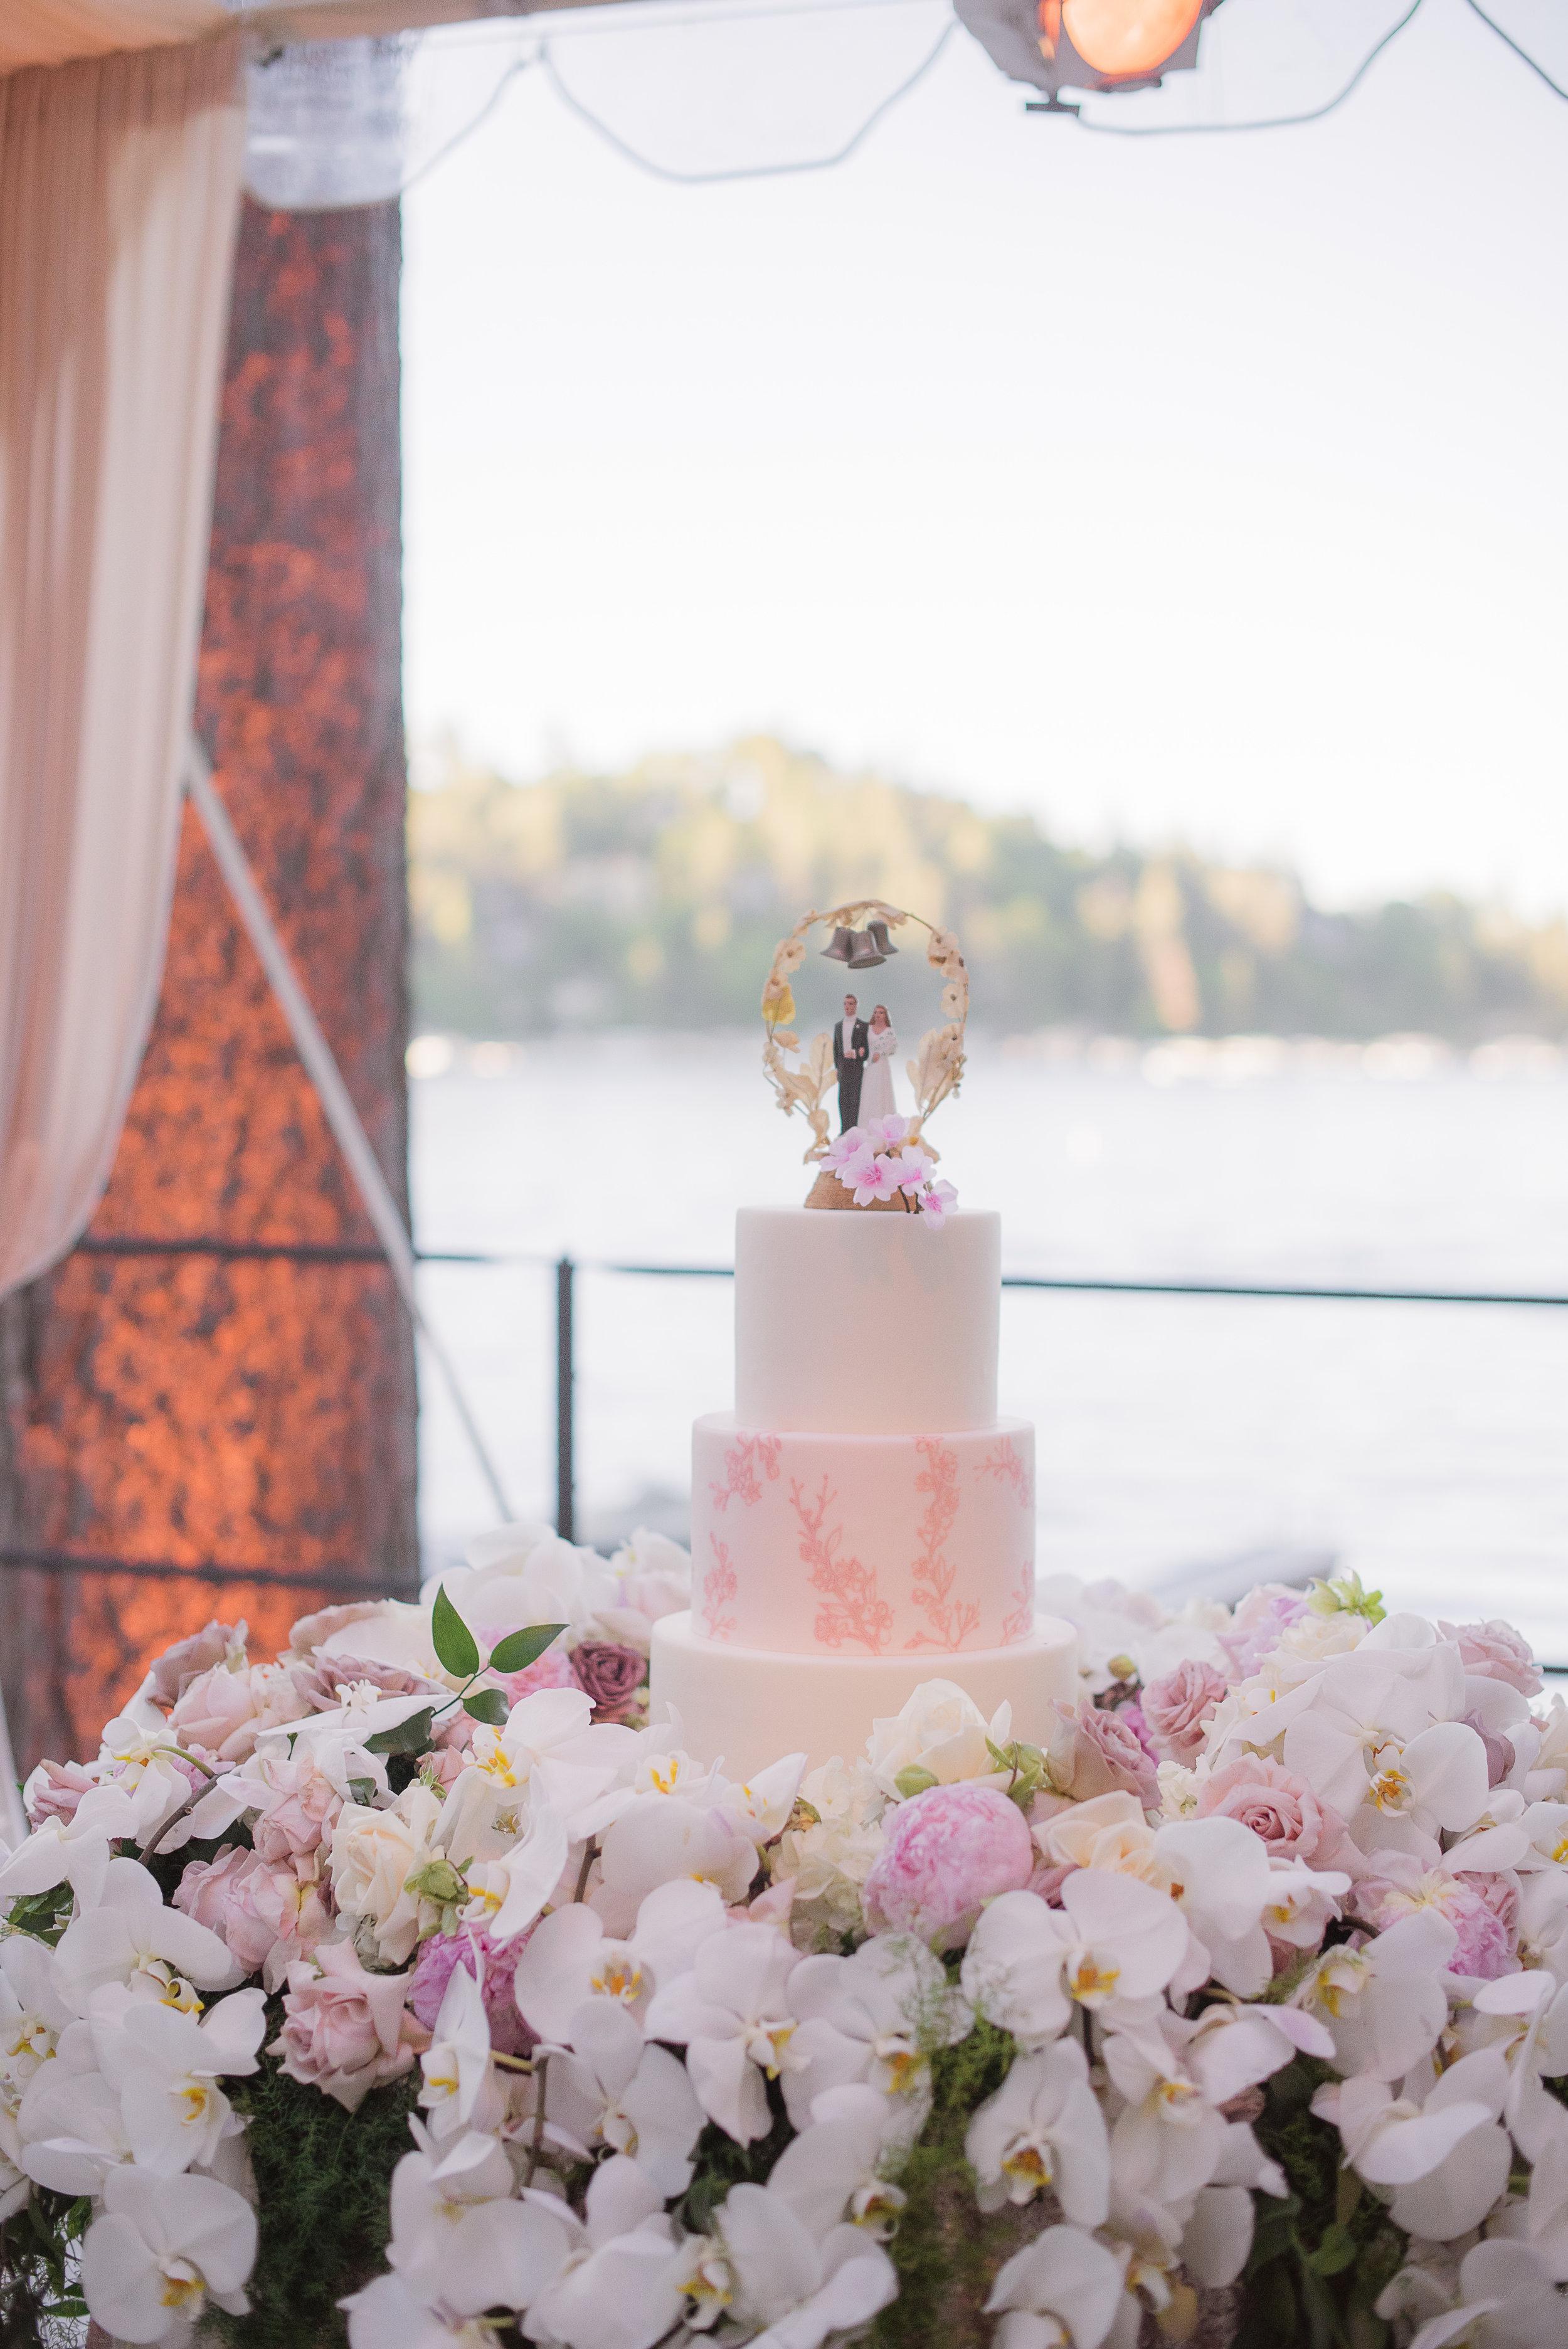 Lake arrownhead Wedding cake .jpg